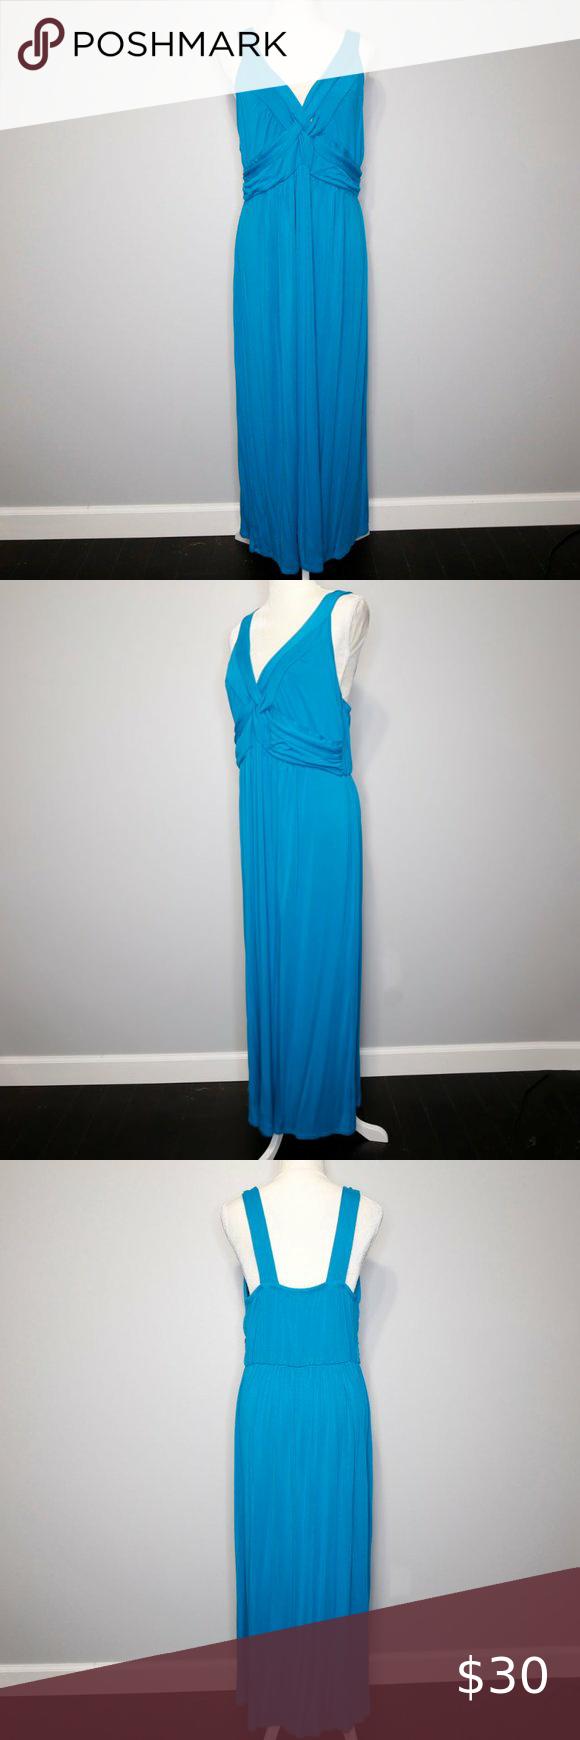 Ing Teal Blue V Neck Stretchy Maxi Dress Ing Teal Blue V Neck Stretchy Maxi Dress 2x Rayon Spandex Dress Size Chart Women Color Block Maxi Dress Maxi Dress [ 1740 x 580 Pixel ]